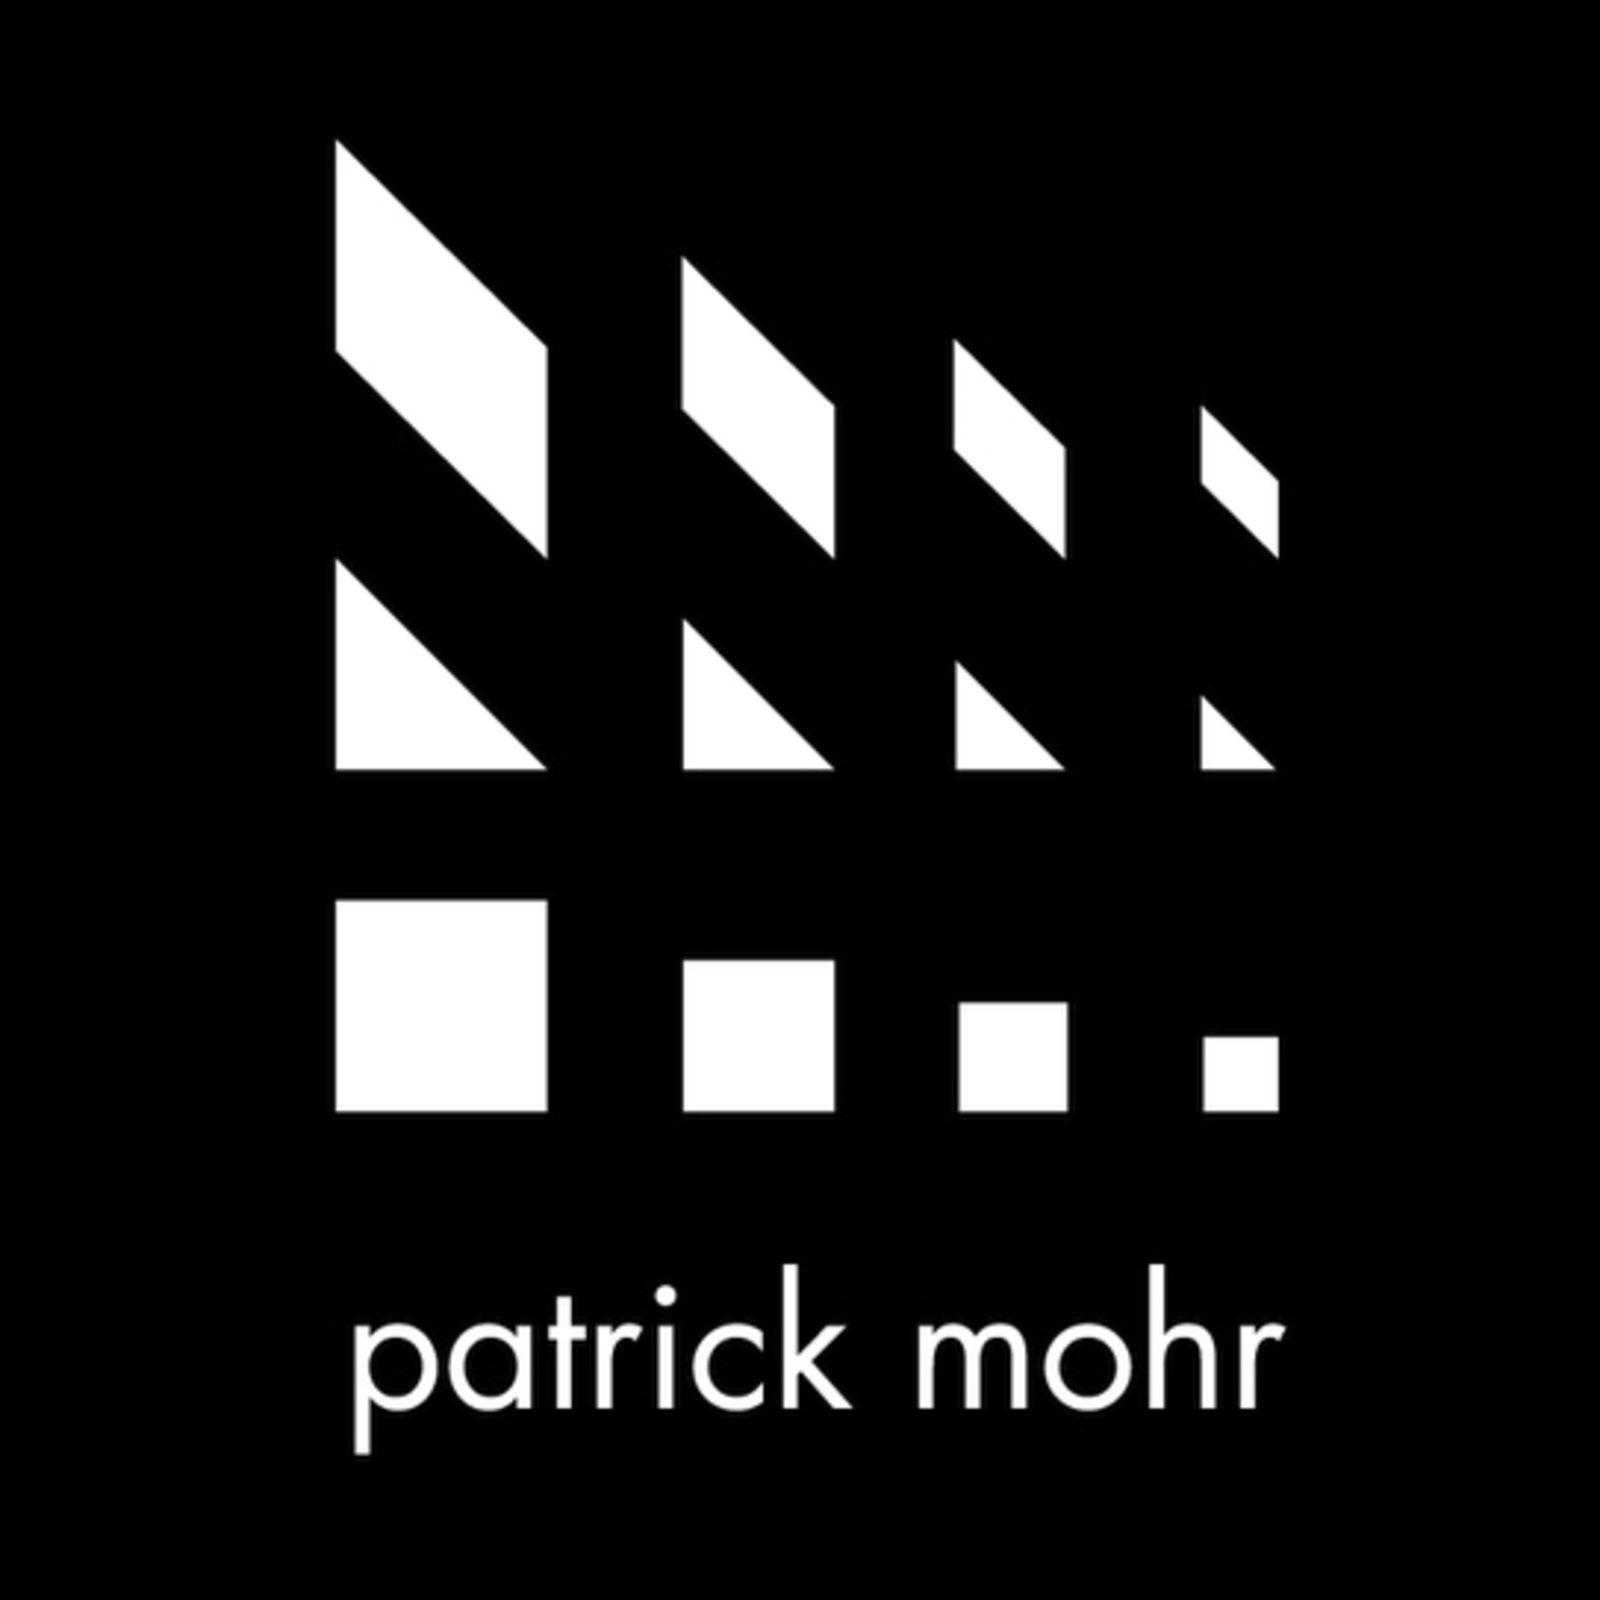 patrick mohr